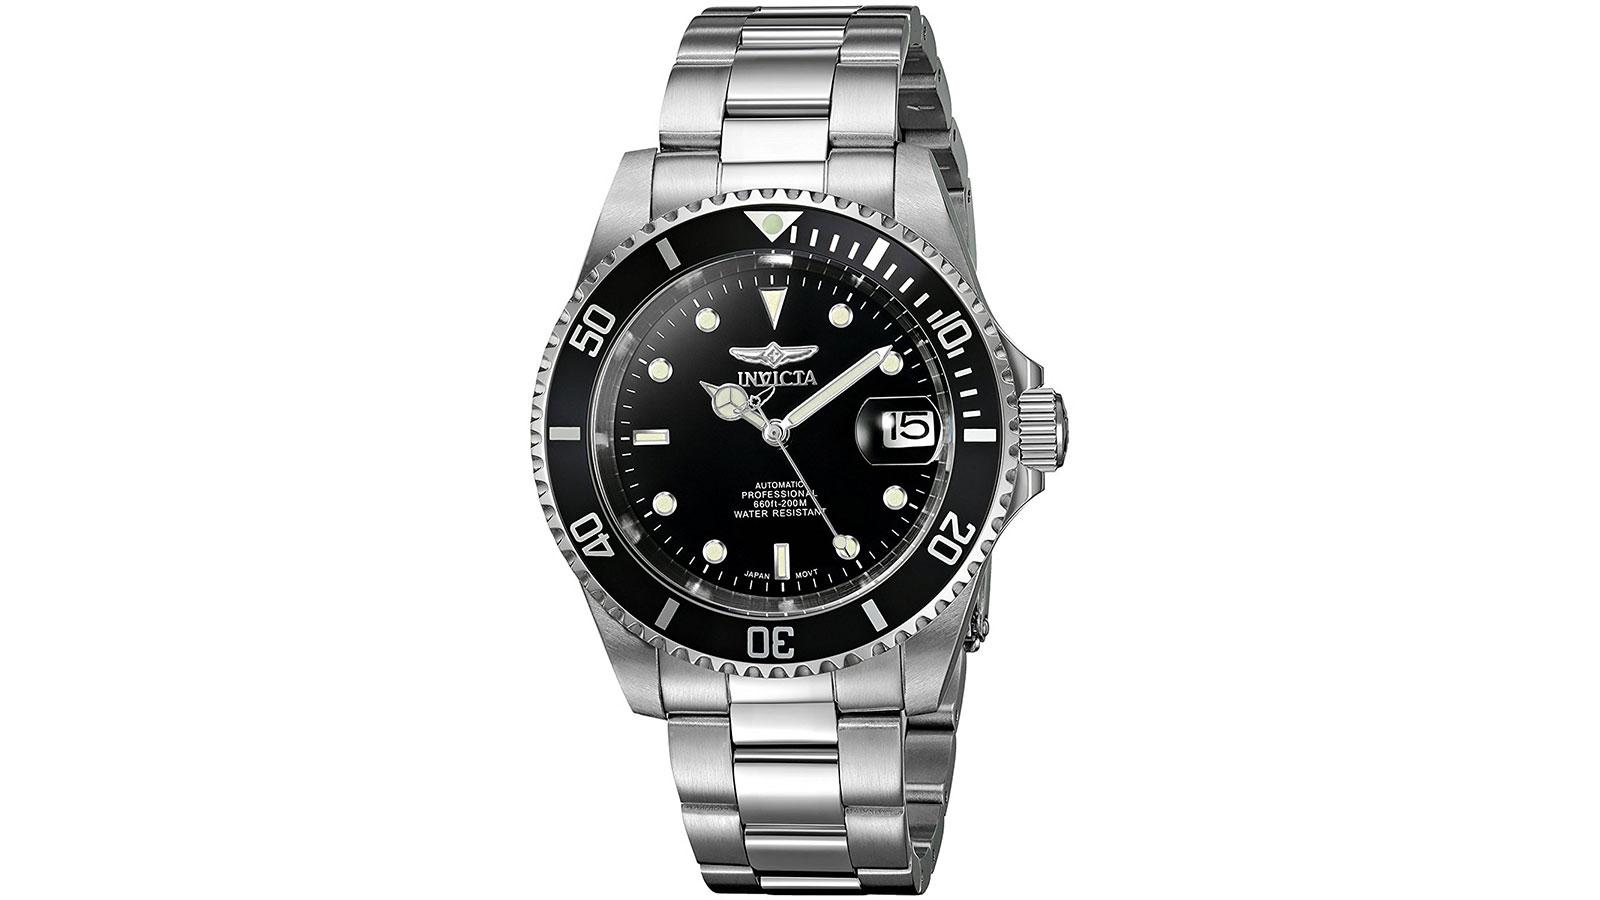 Invicta Men's 8926OB Pro Diver Watch   best men's watches under $100